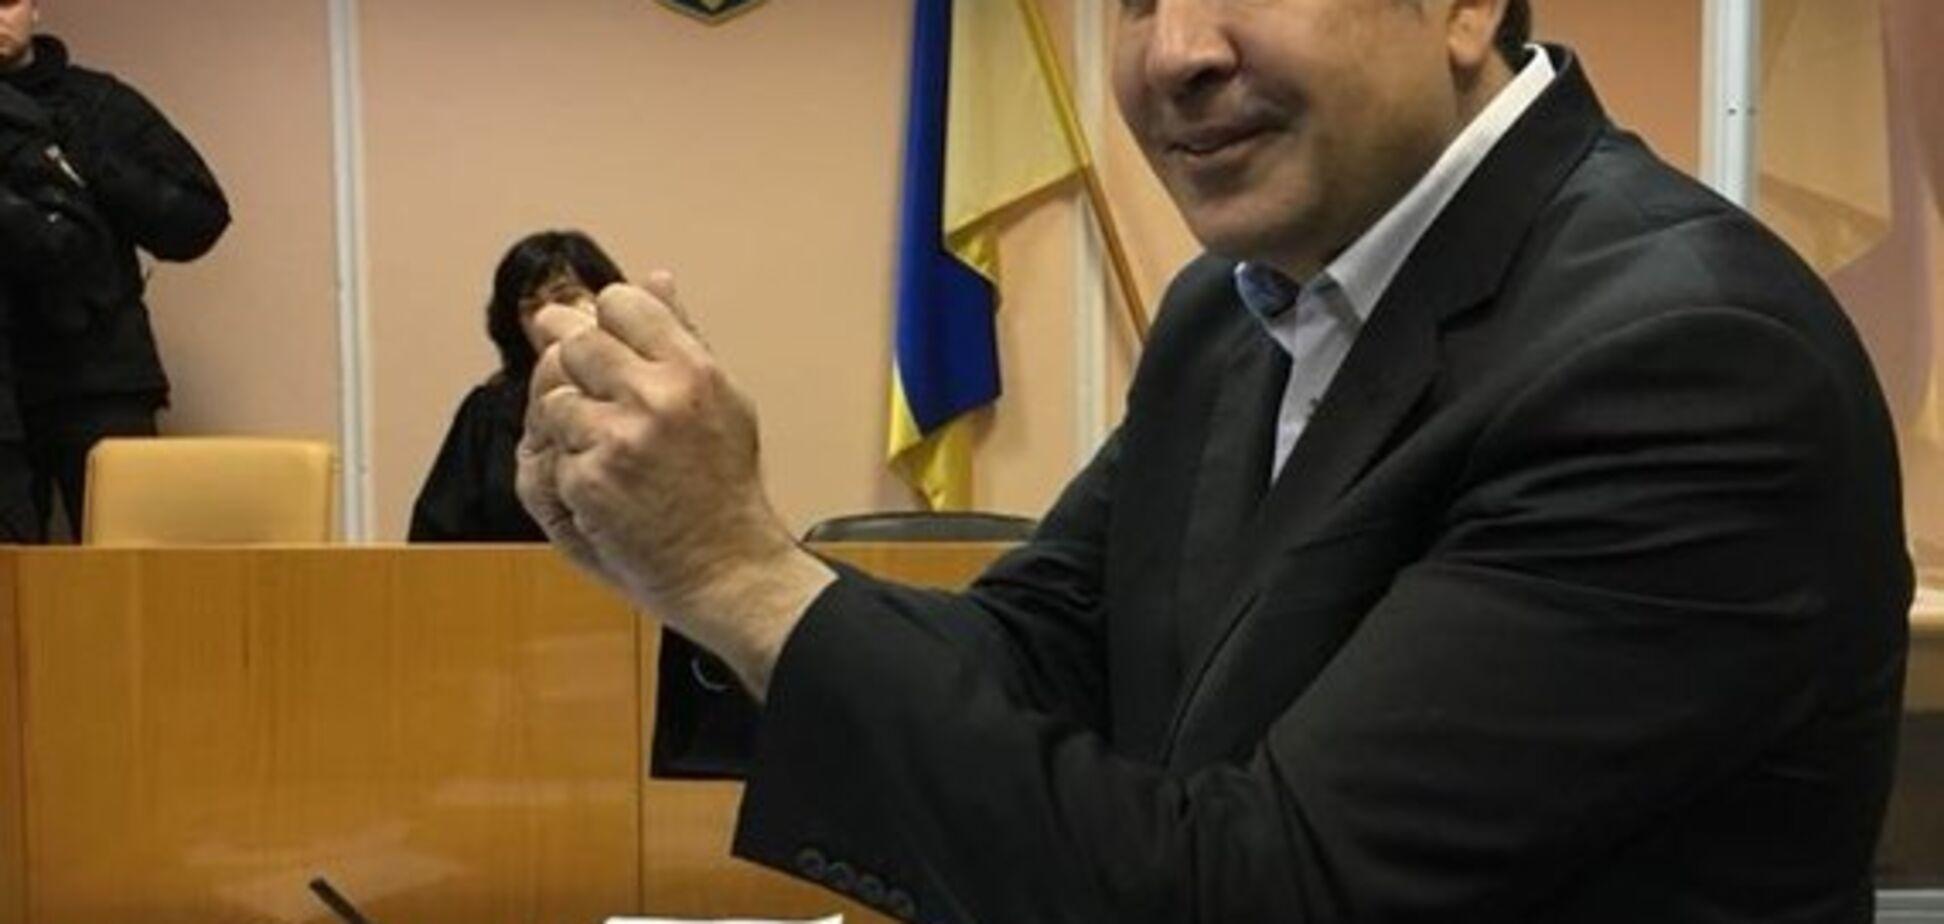 Спецслужбы России начали охоту на Саакашвили, не исключена ликвидация – прокурор